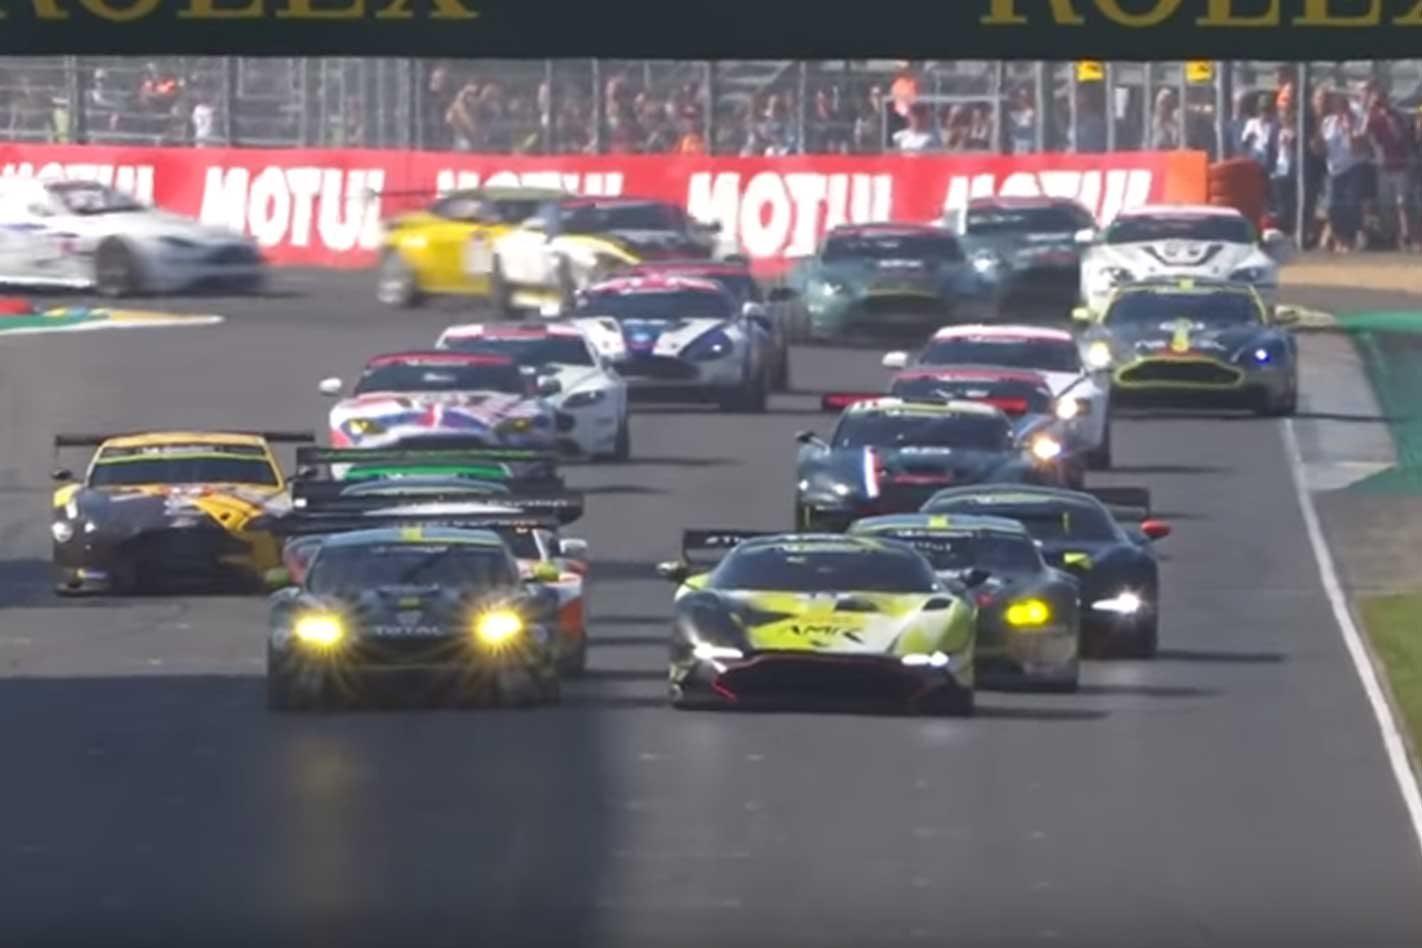 2018 Aston Martin Vantage Race Cars Showcased At Le Mans